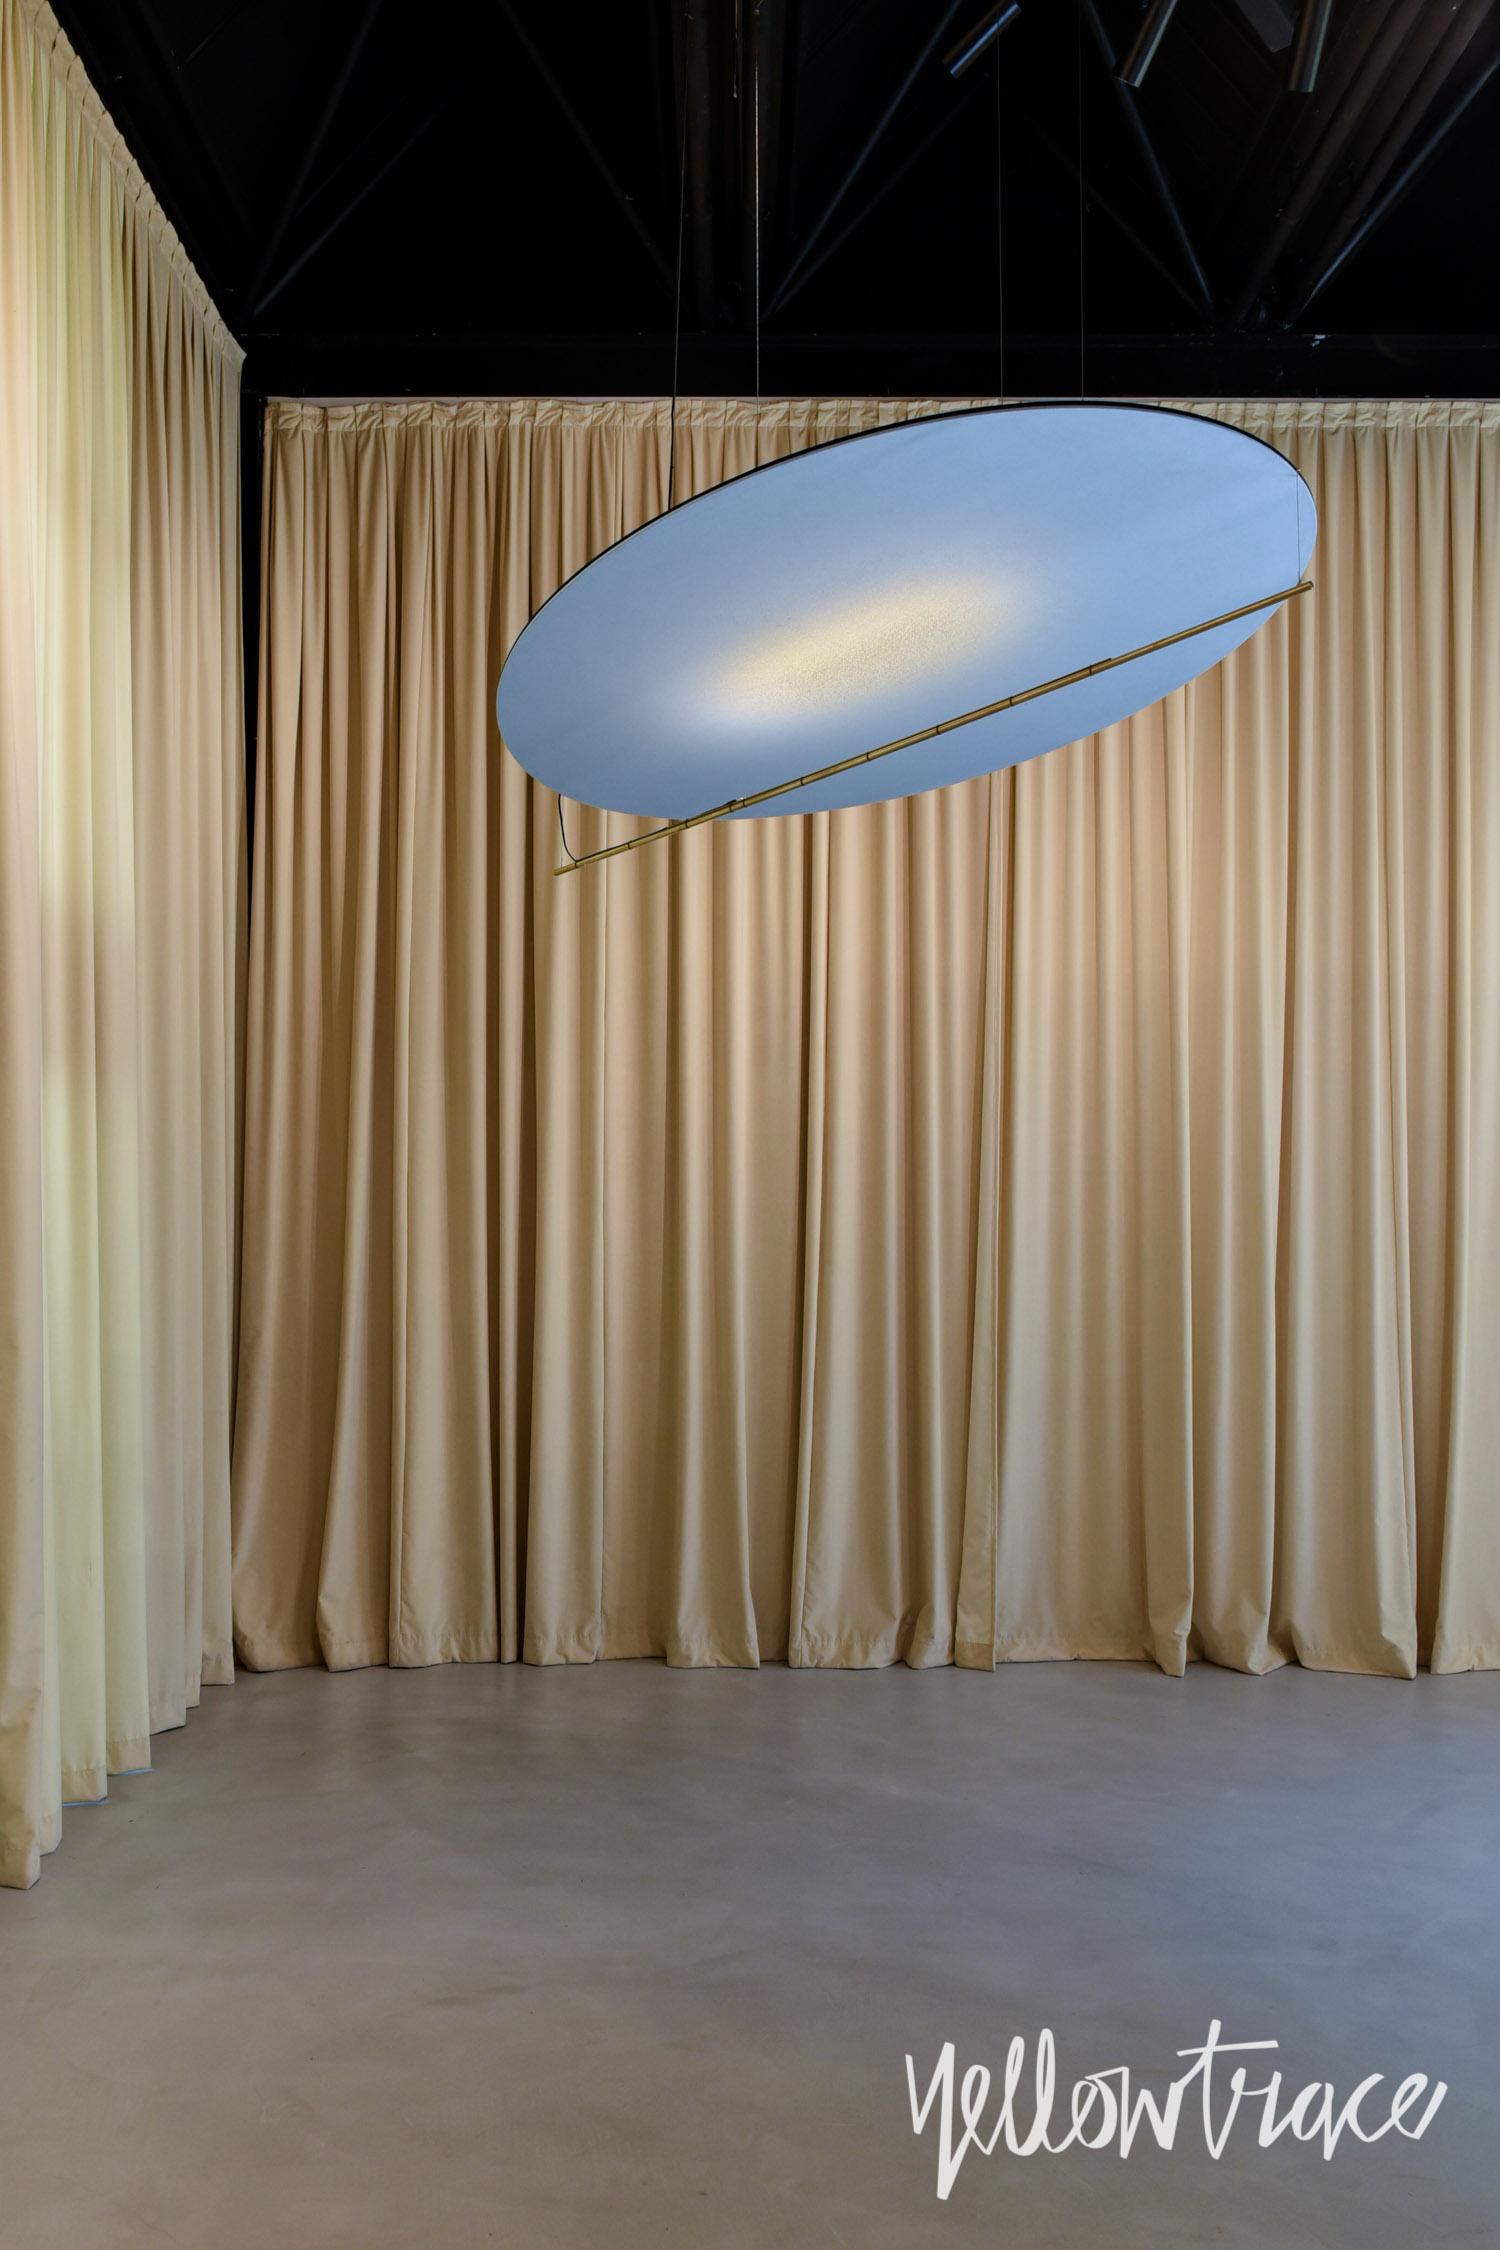 Milan Design Week 2017 Highlights, Foundation by Formafantasma at Spazio Krizia, Photo © Nick Hughes | #Milantrace2017